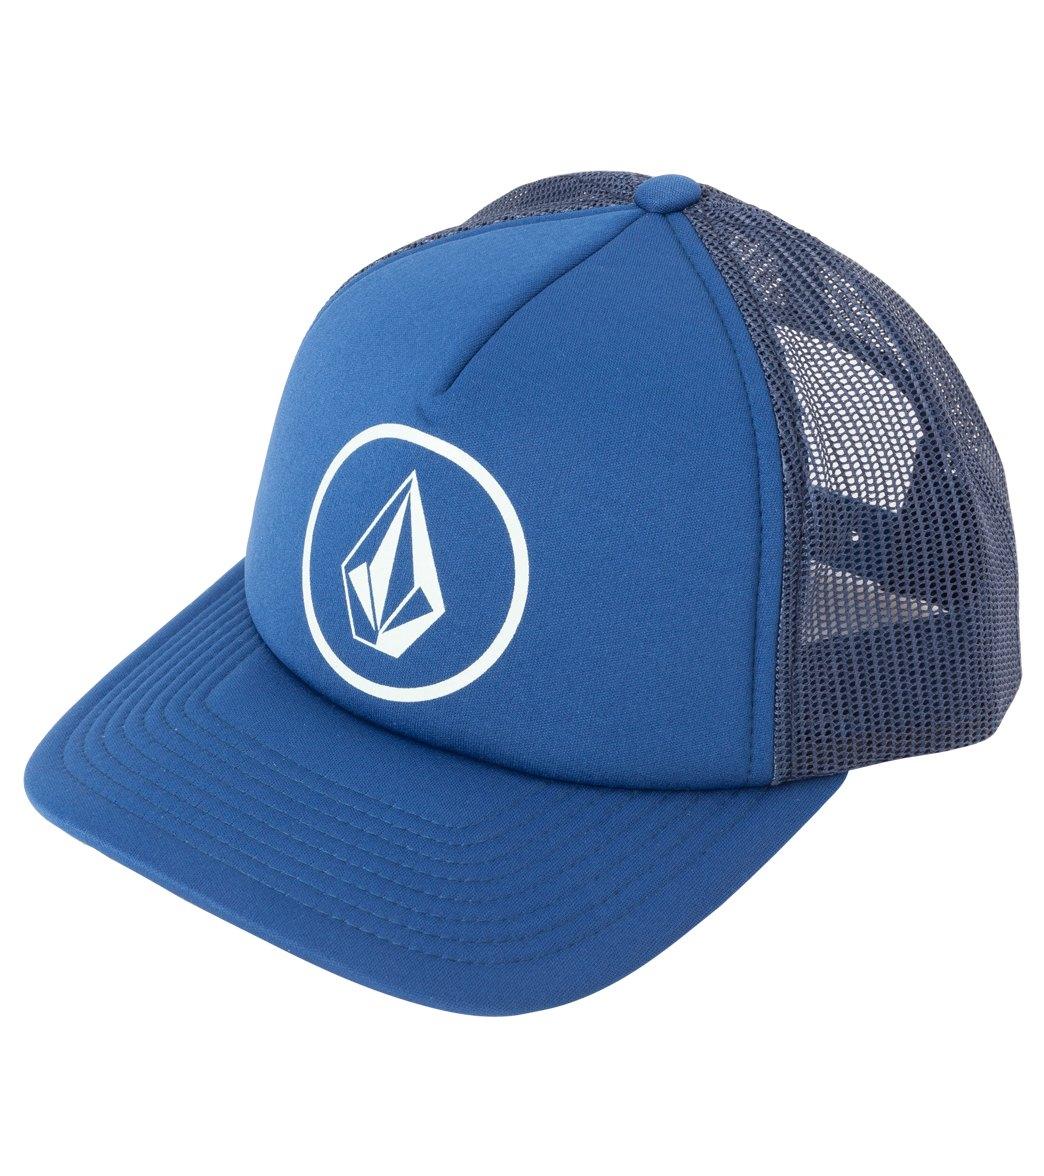 Volcom Nacho Stone Hat at SwimOutlet.com 5c16c2bba92f